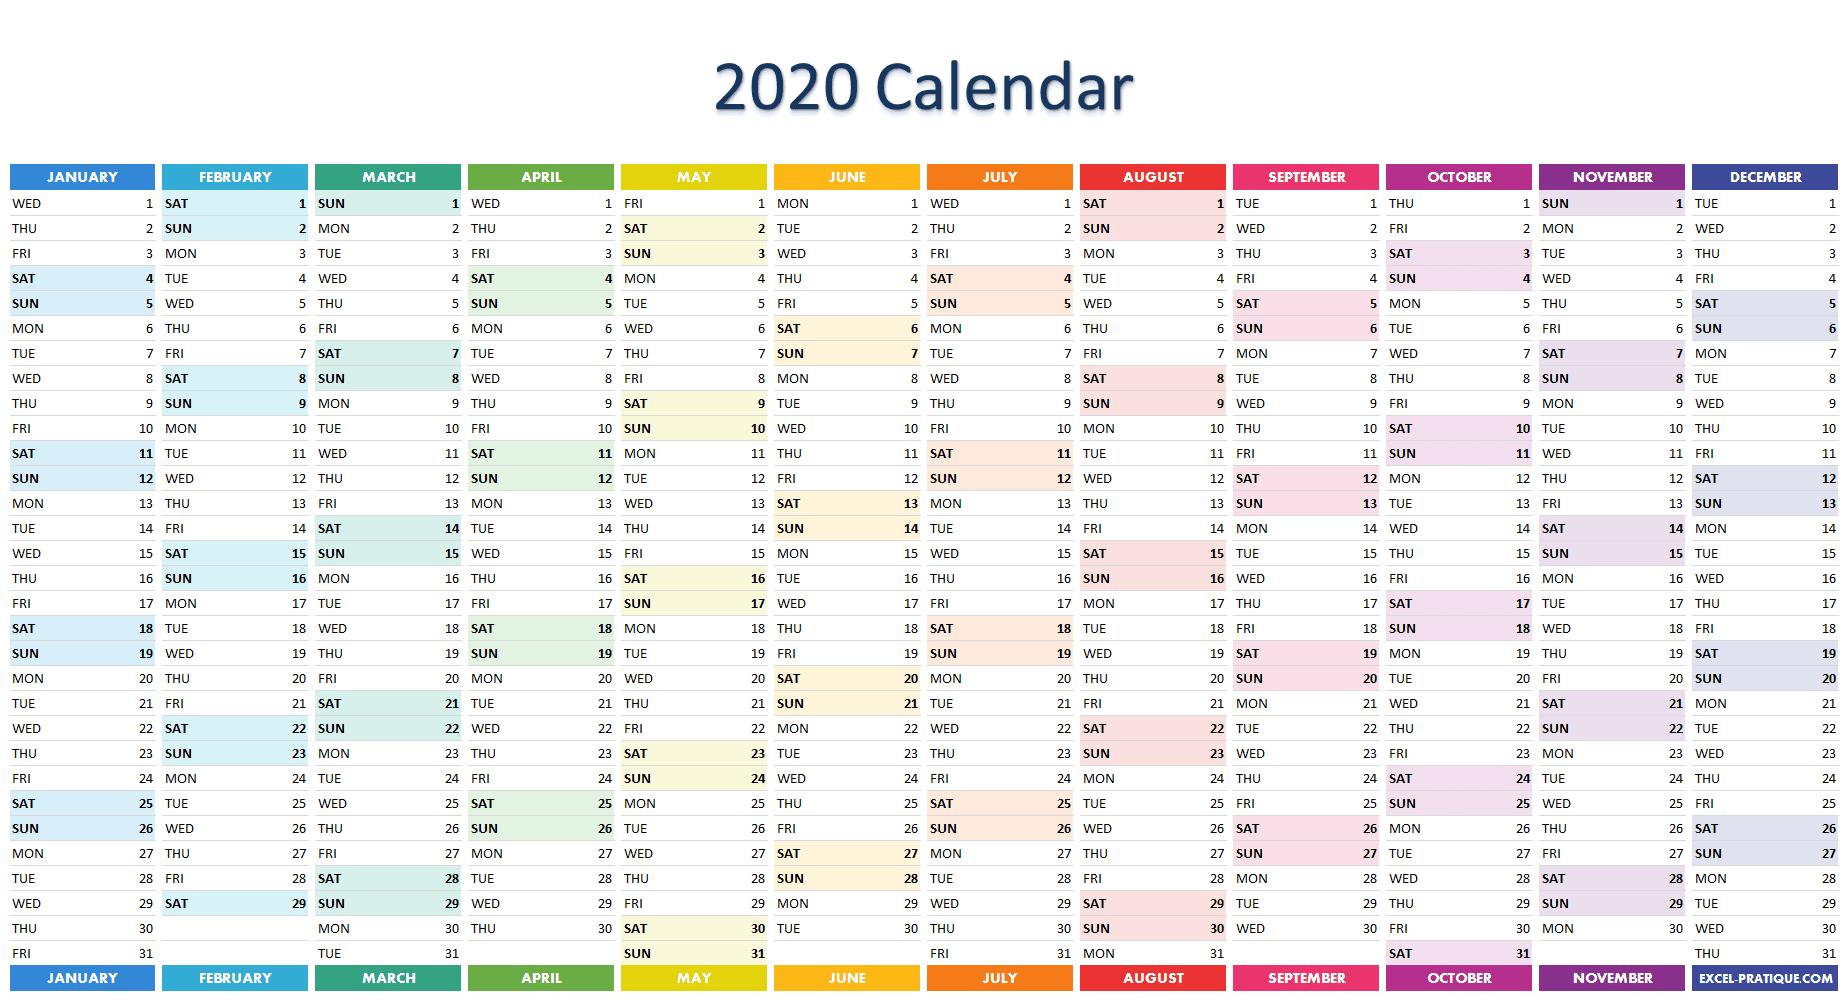 Calendar 2020.2020 Calendar